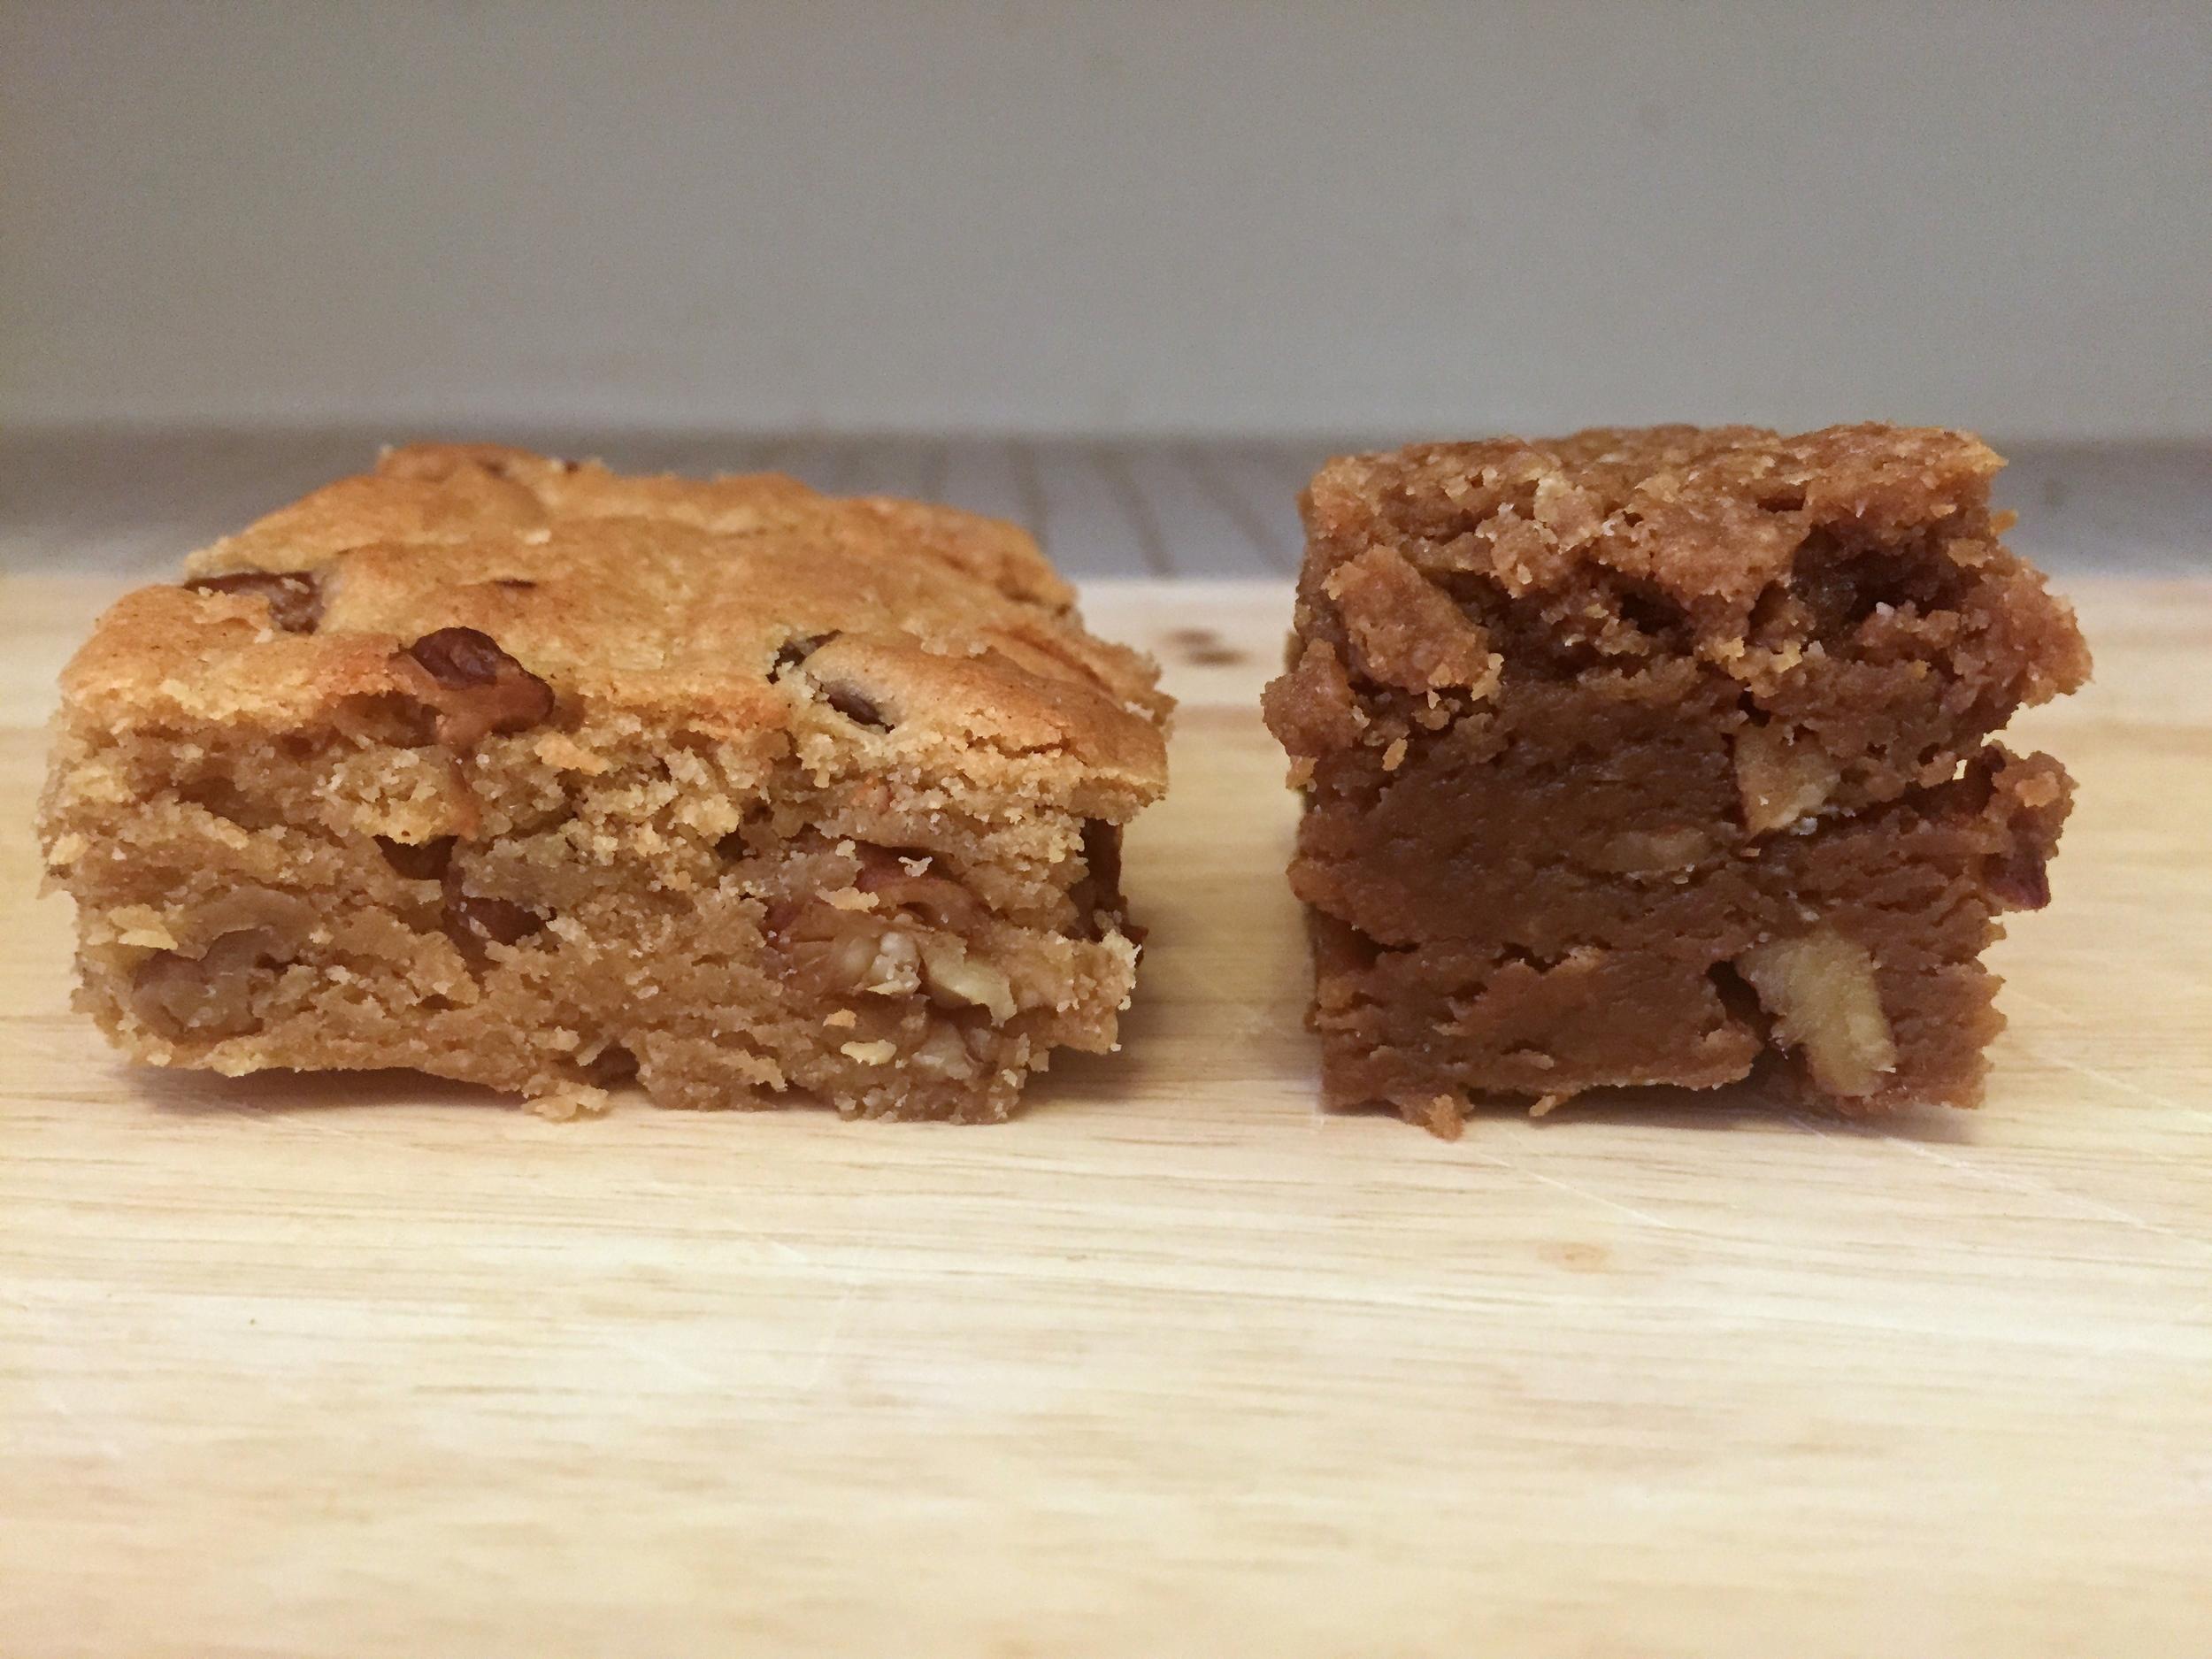 Cook's (left). bittman (right)